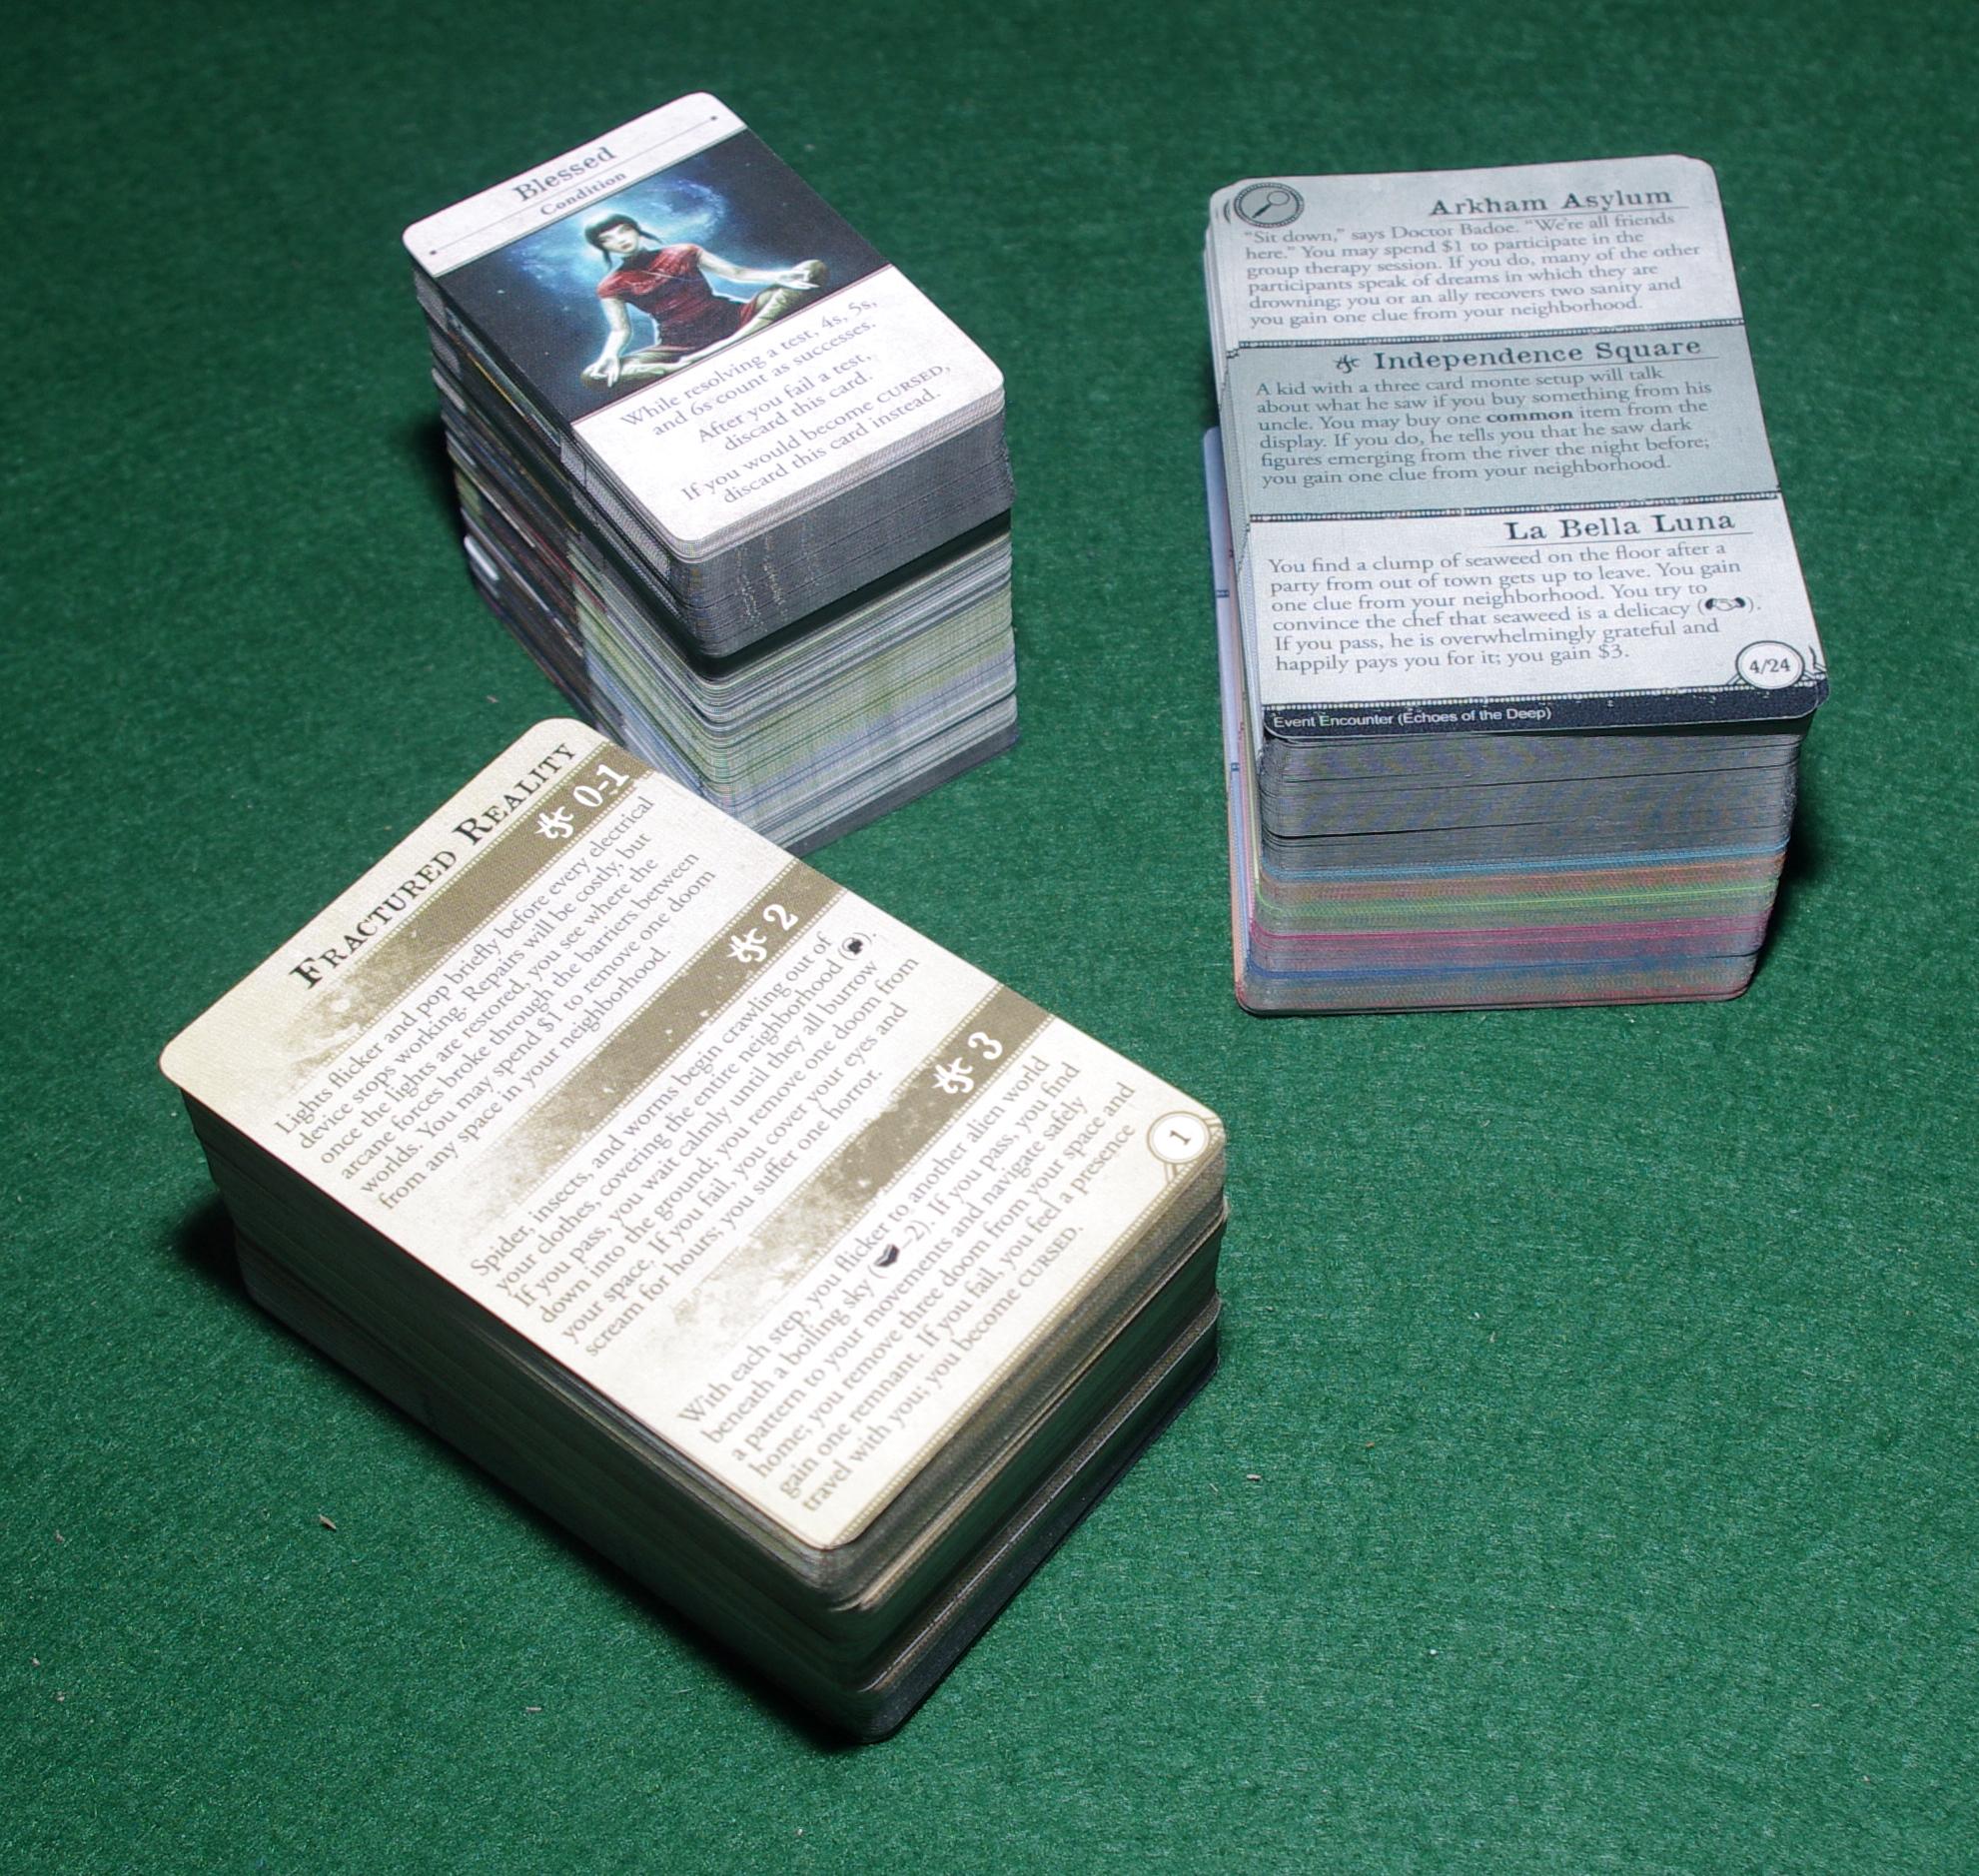 Arkham Horror 3rd Edition - Investigators - Cards